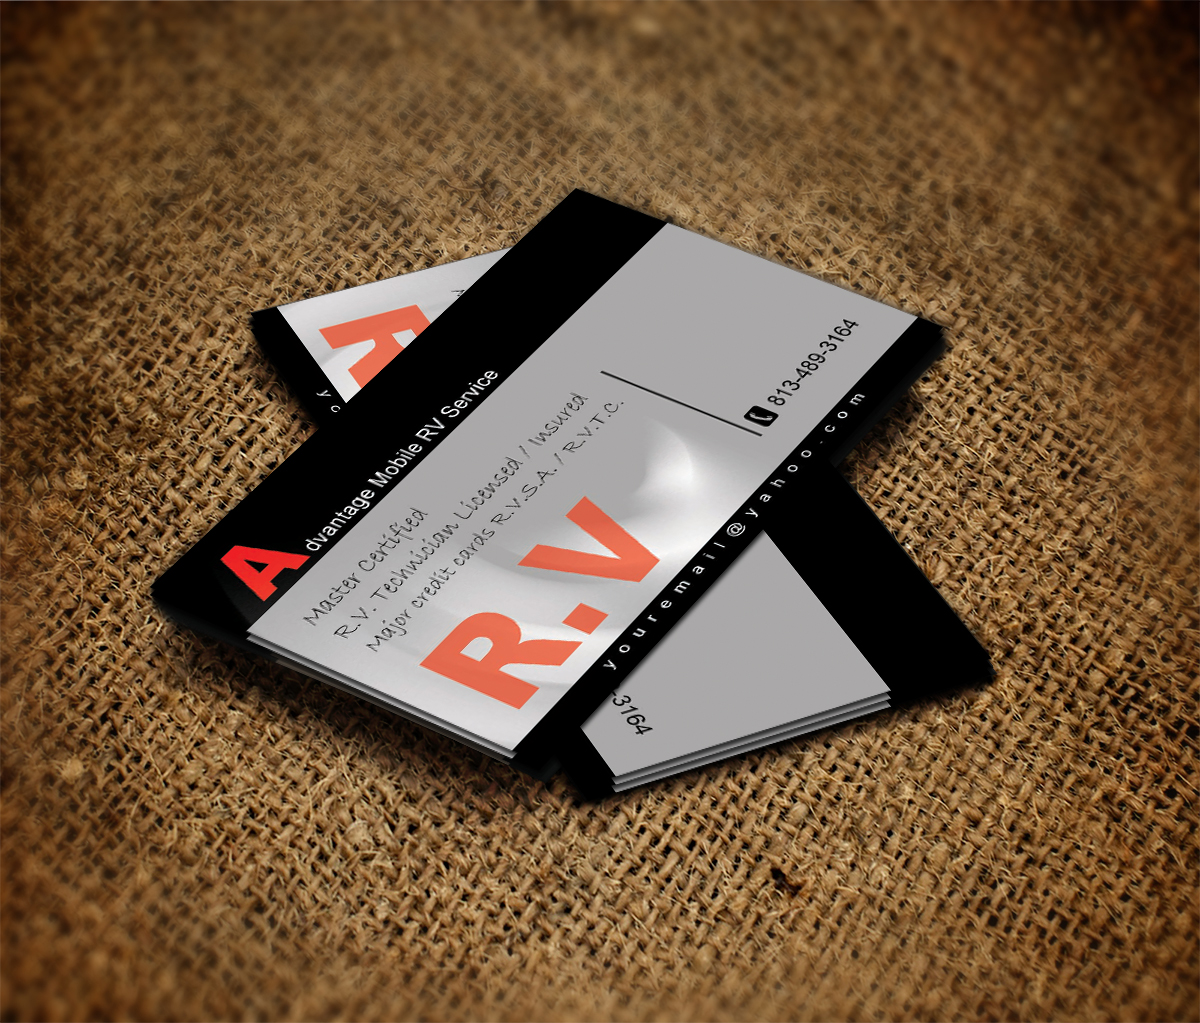 Insurance business card design for advantage mobile rv service by business card design by ma for advantage mobile rv service design 3854769 colourmoves